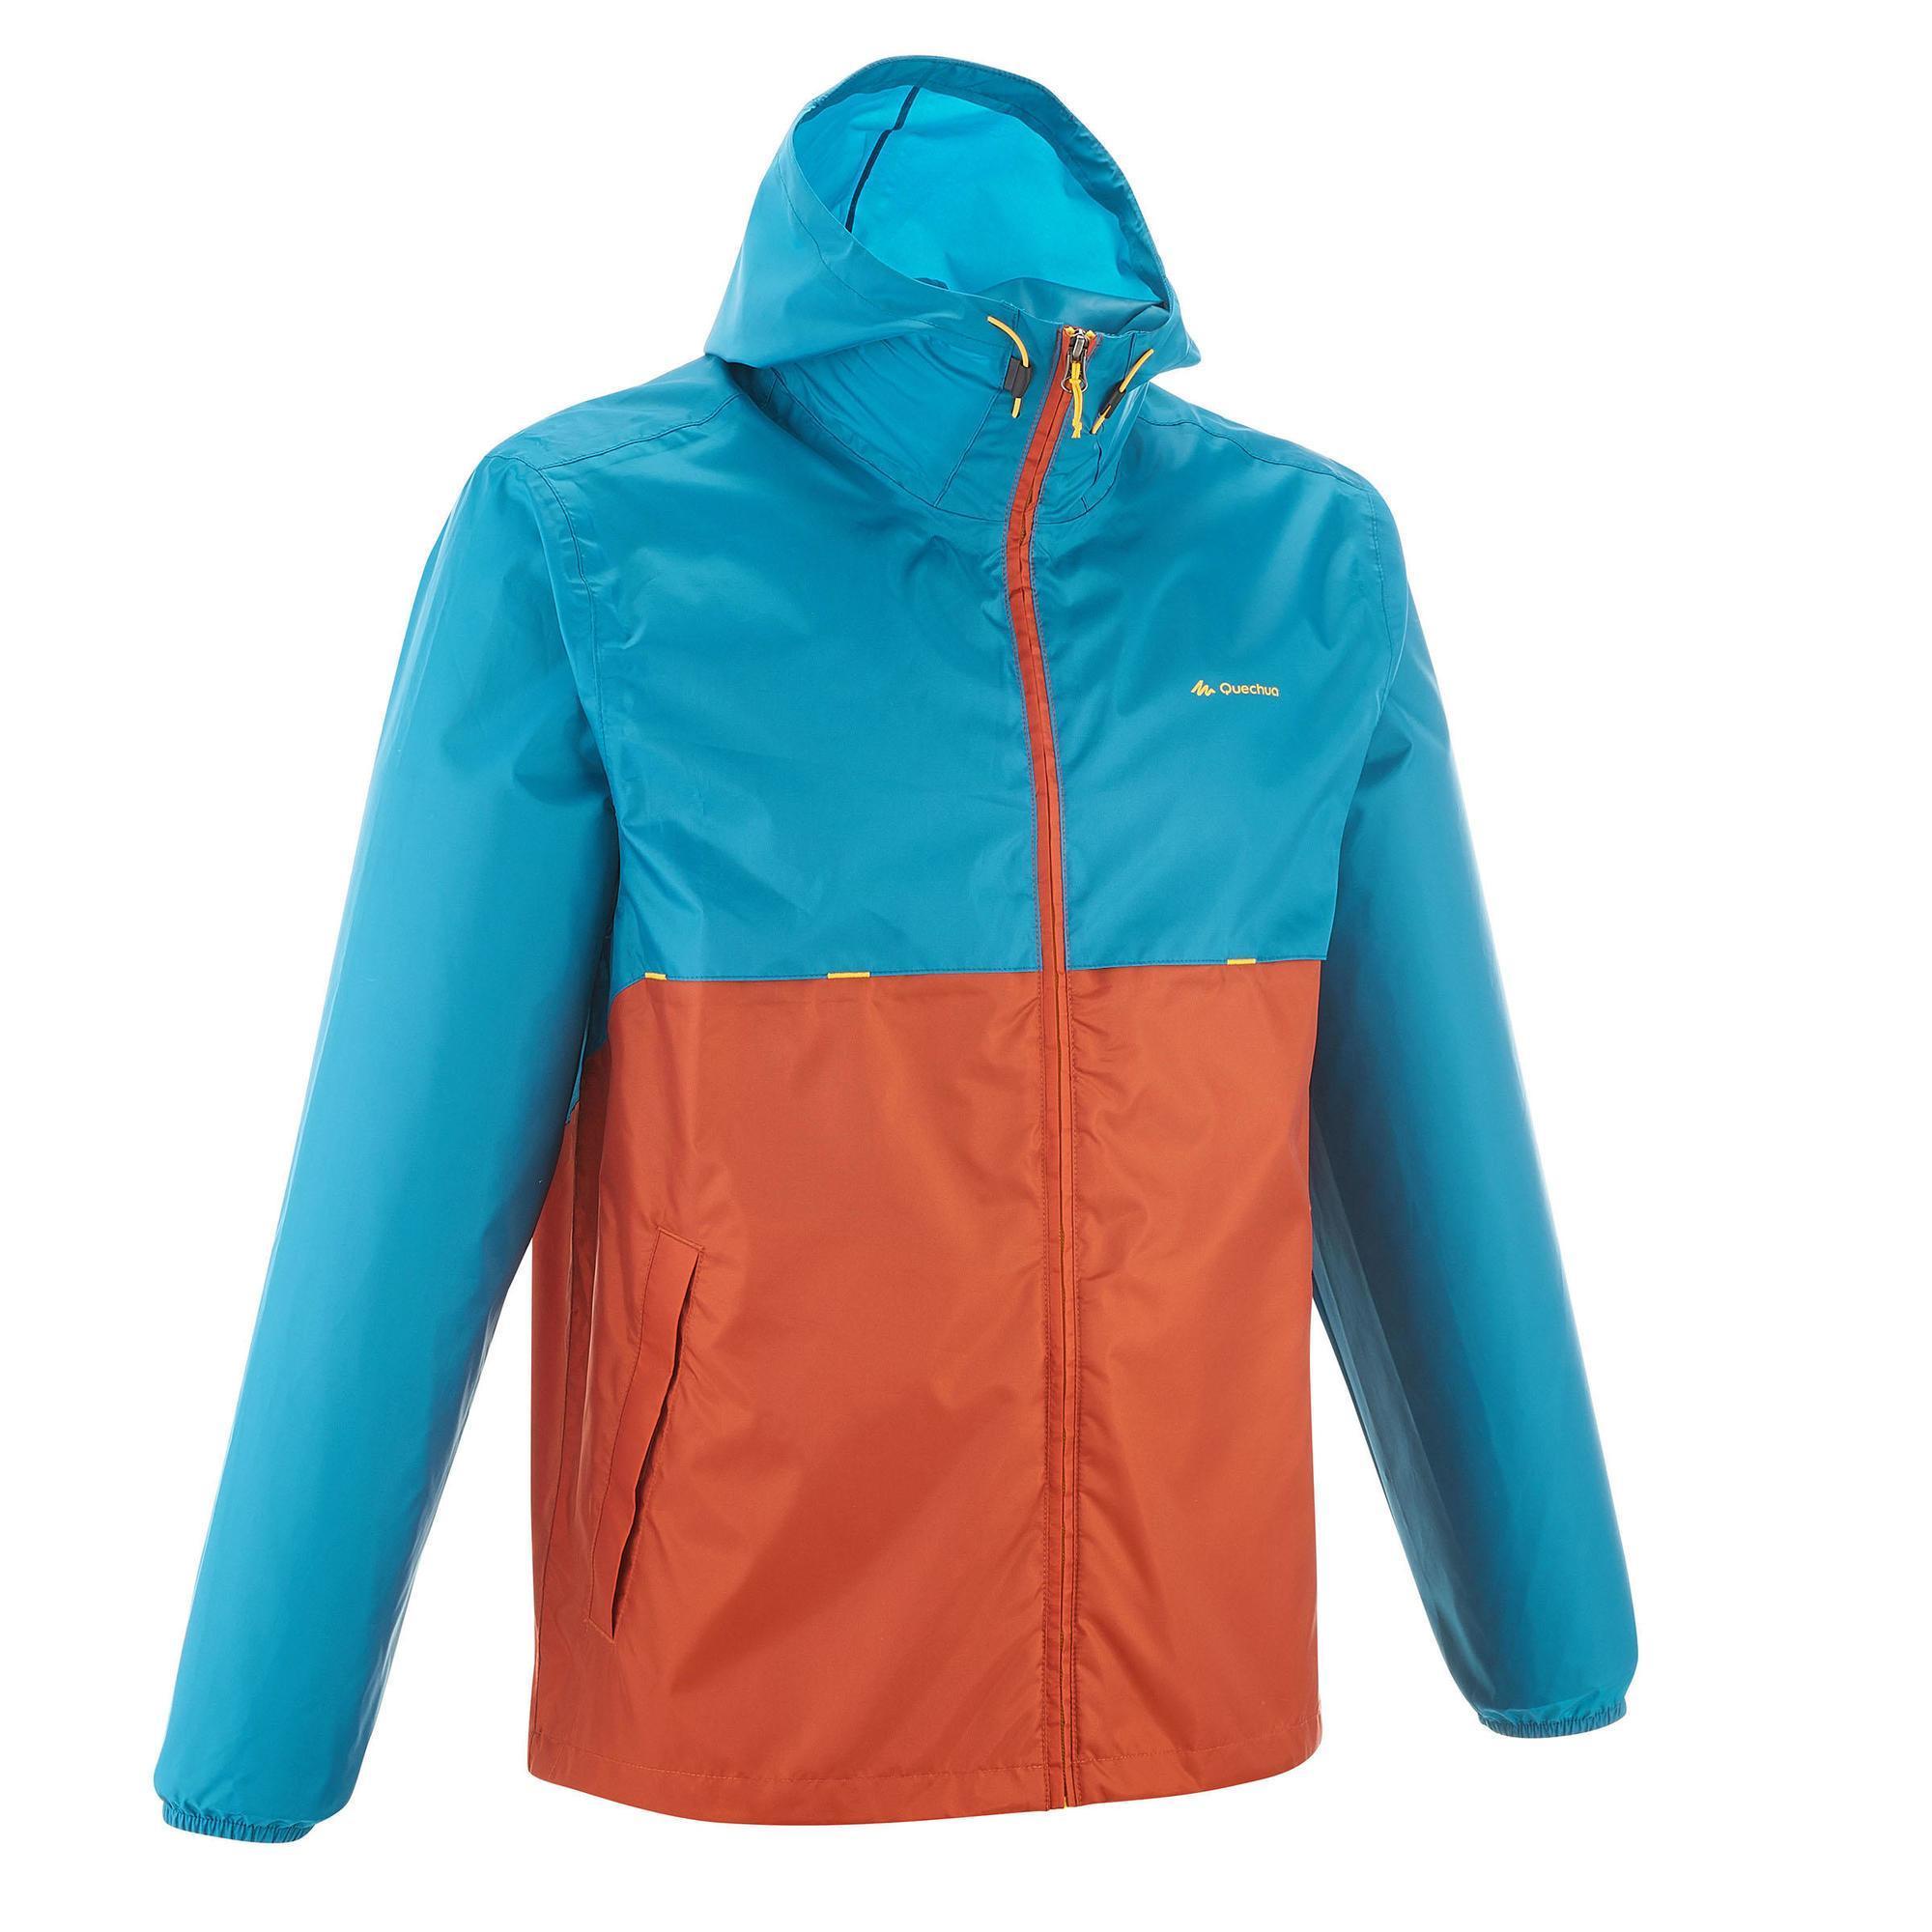 Quechua Waterdicht regenjack natuurwandelingen heren Raincut rits oranje en lichtblauw